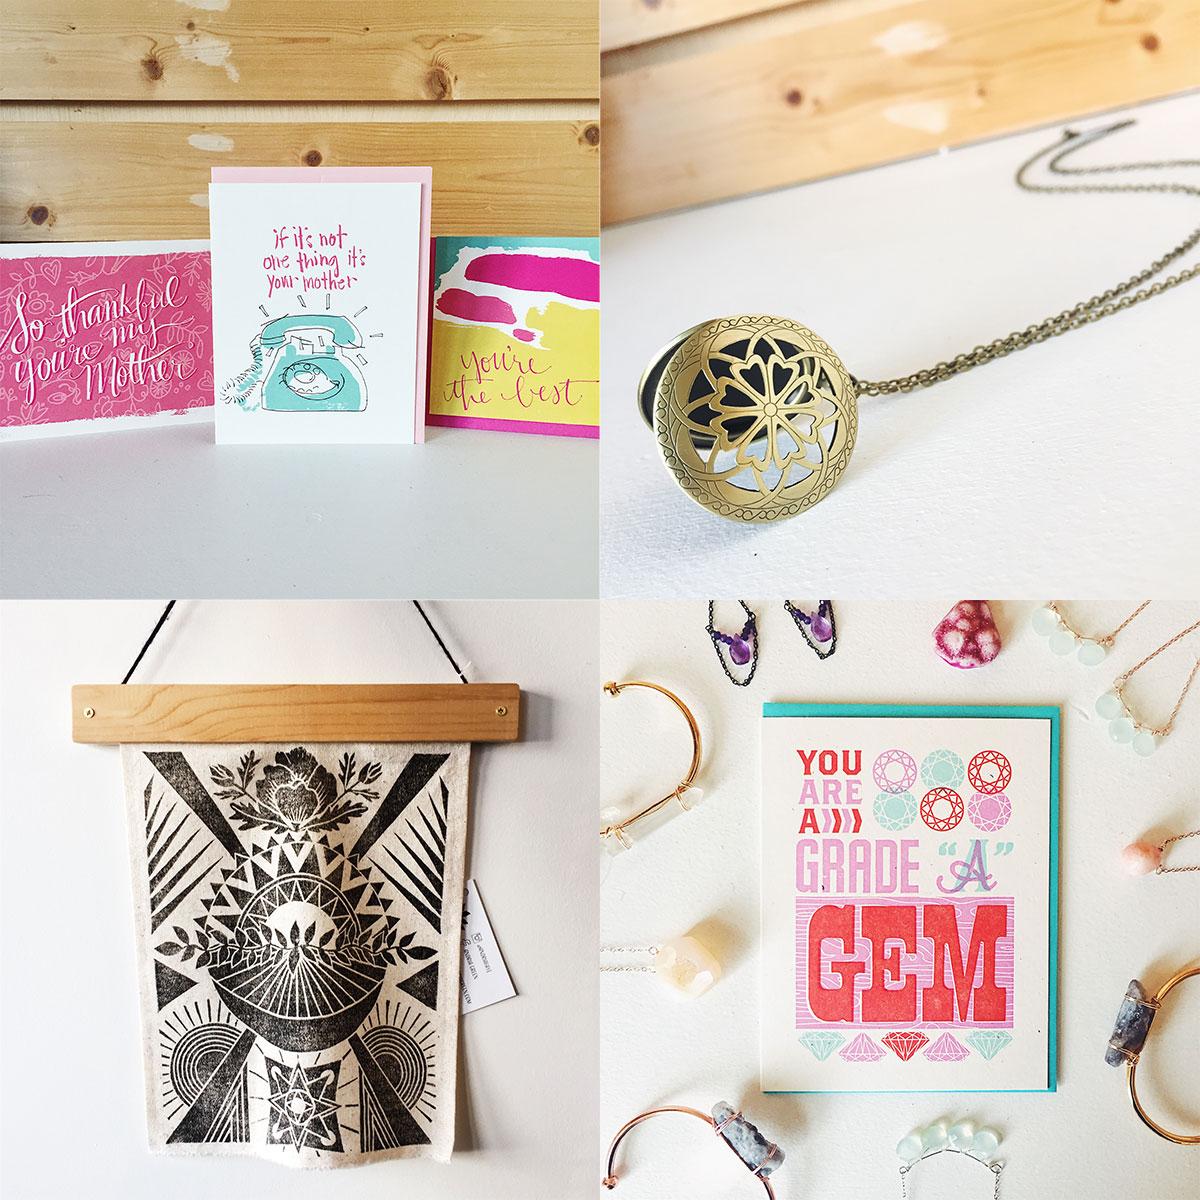 ICYMI May 4 : Handmade Mother's Day gift ideas at Homespun: Modern Handmade